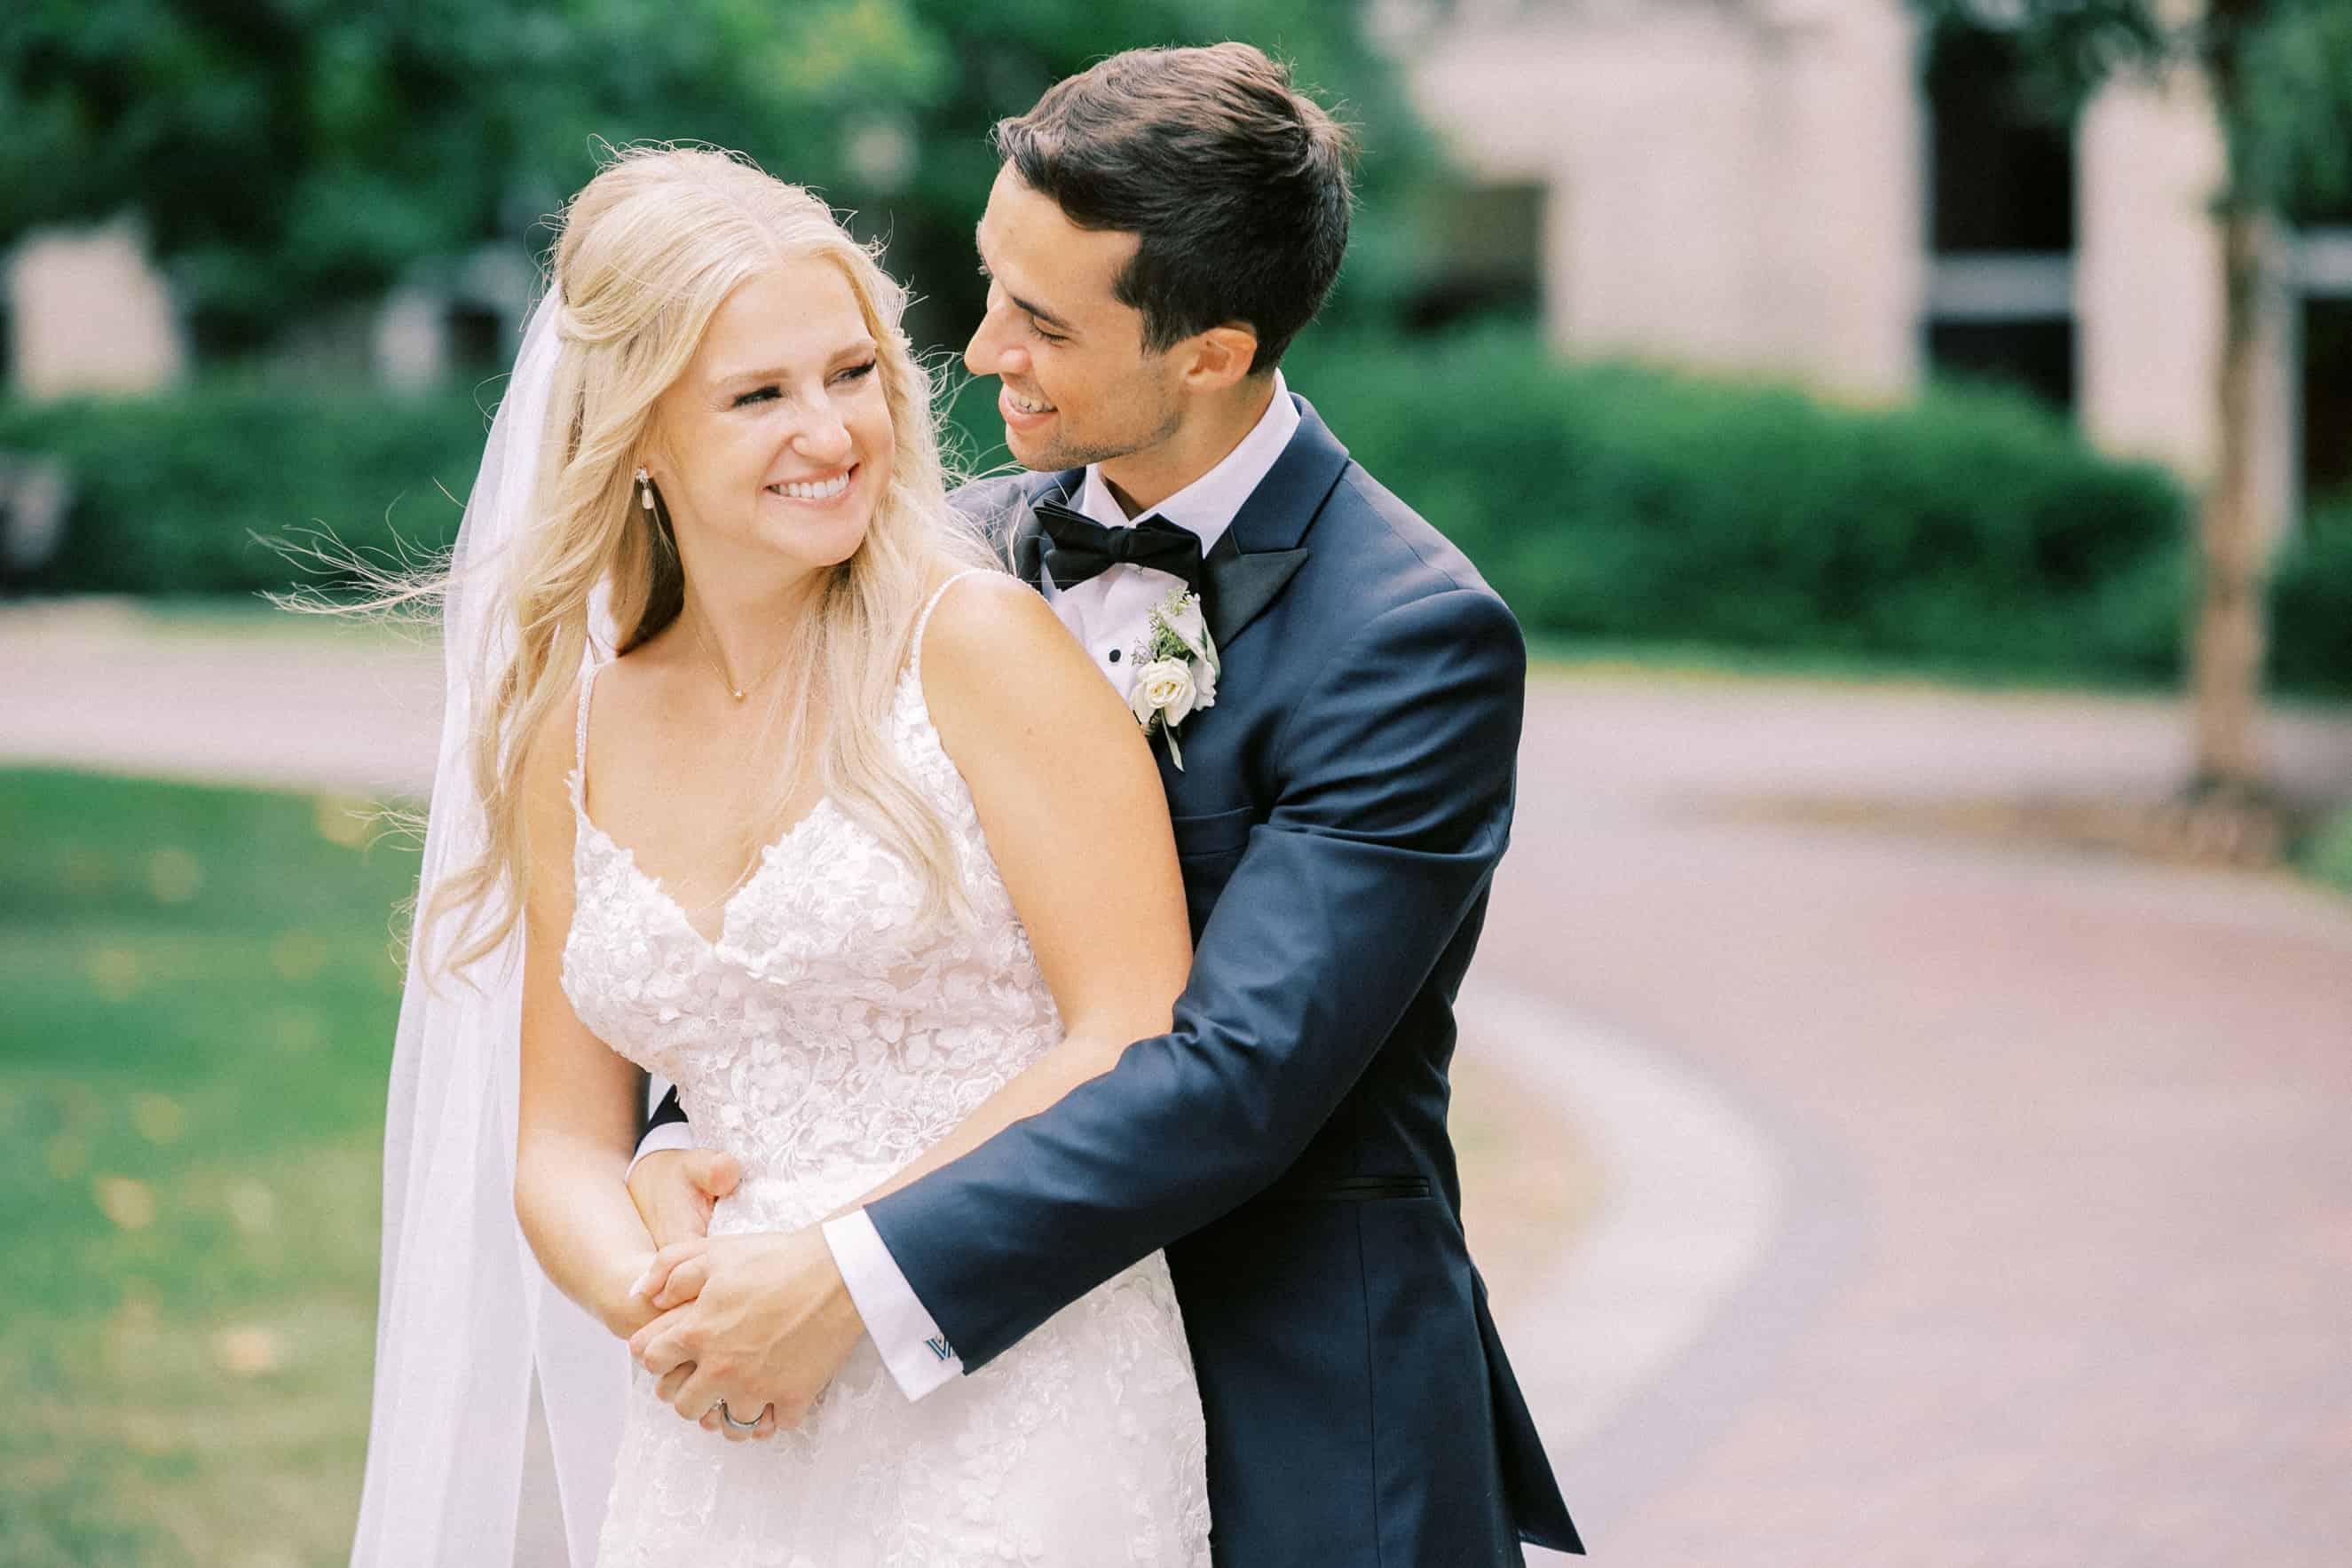 Villanova Pictures of Wedding